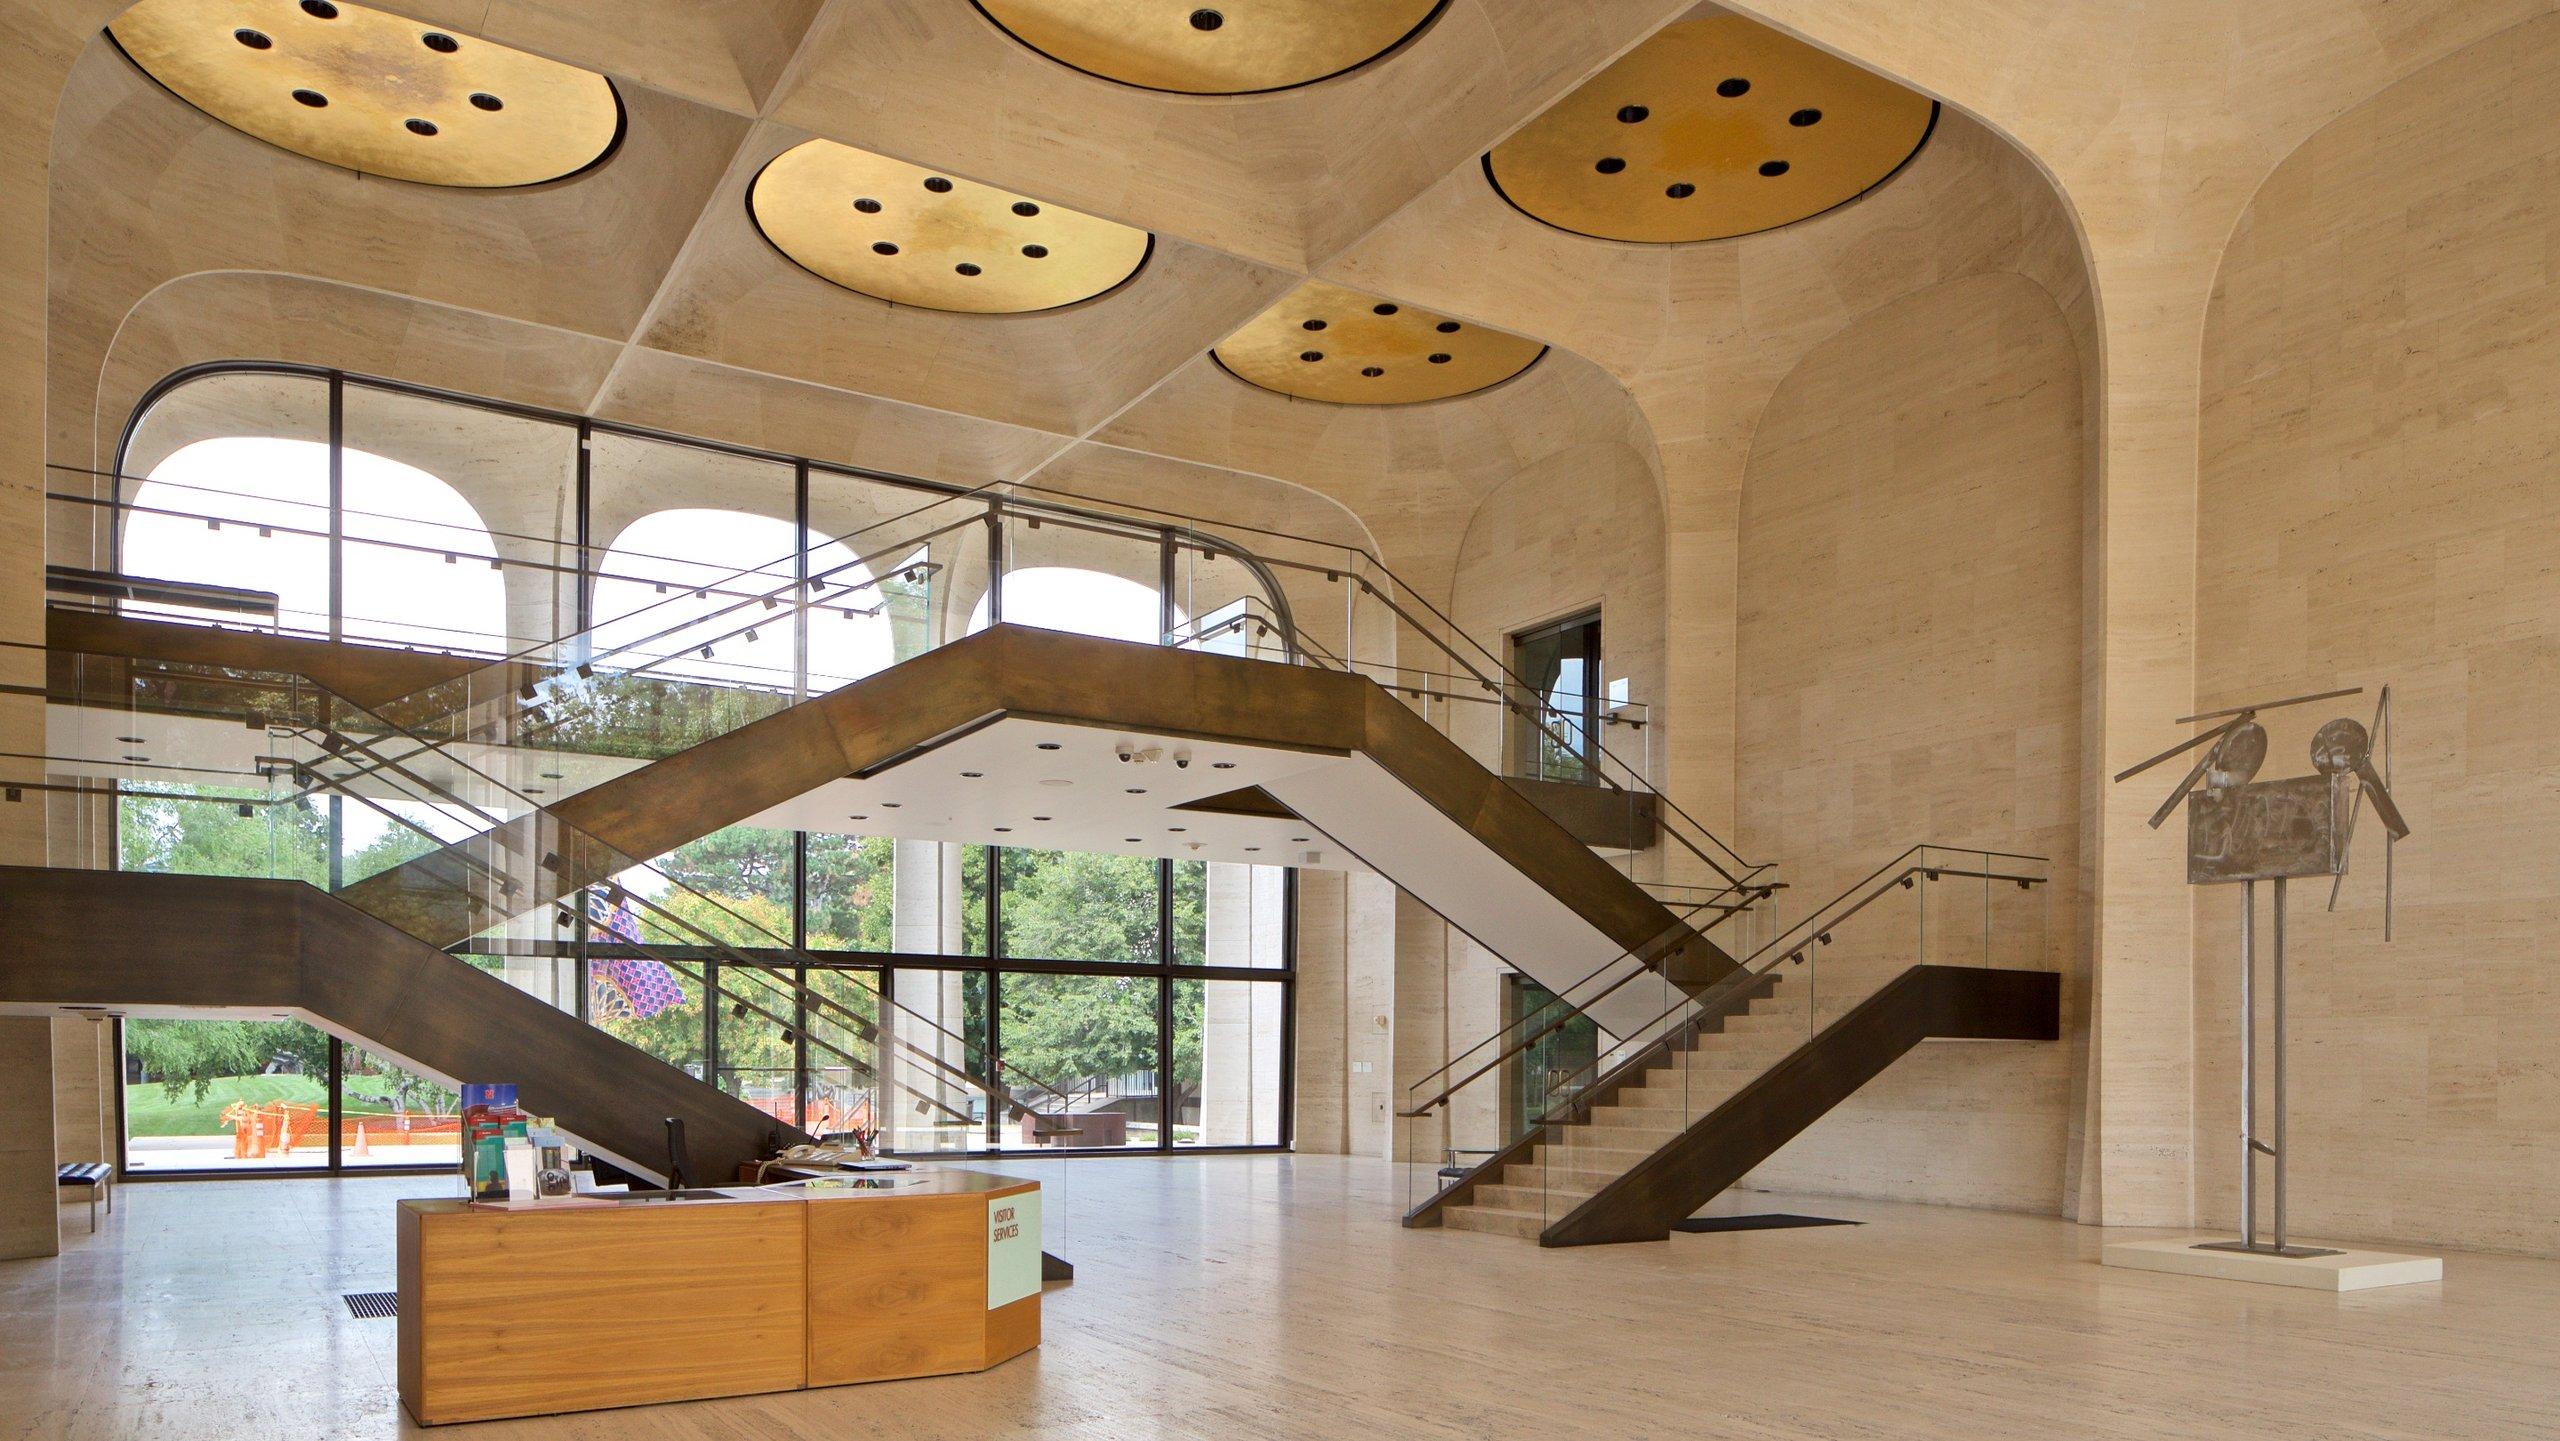 Sheldon Museum of Art (musée d'art), Lincoln, Nebraska, États-Unis d'Amérique